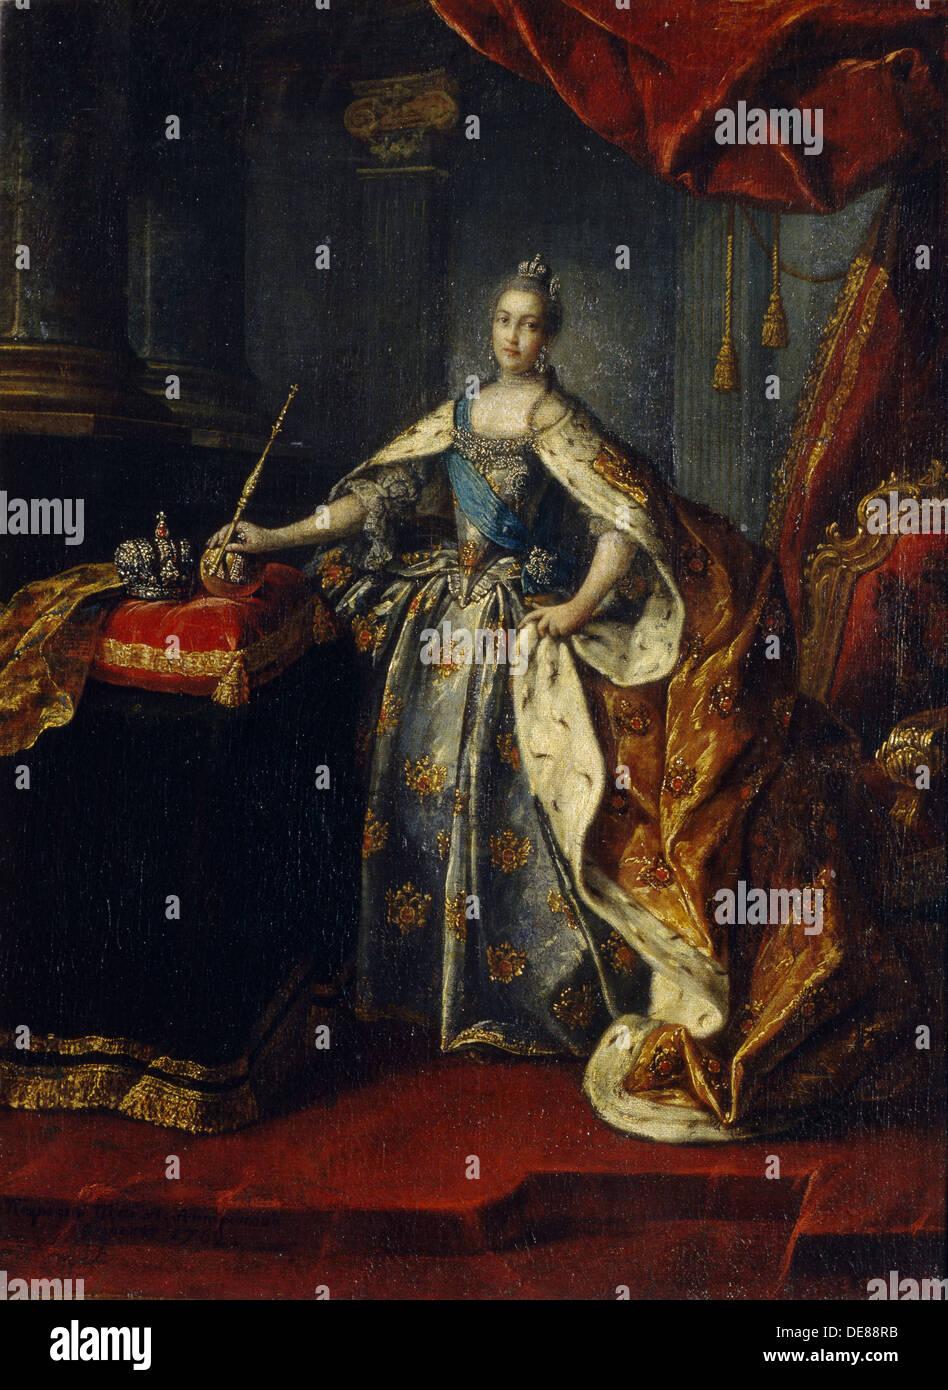 Portrait of Empress Catherine II (1729-1796), 1762. Artist: Antropov, Alexei Petrovich (1716-1795) - Stock Image